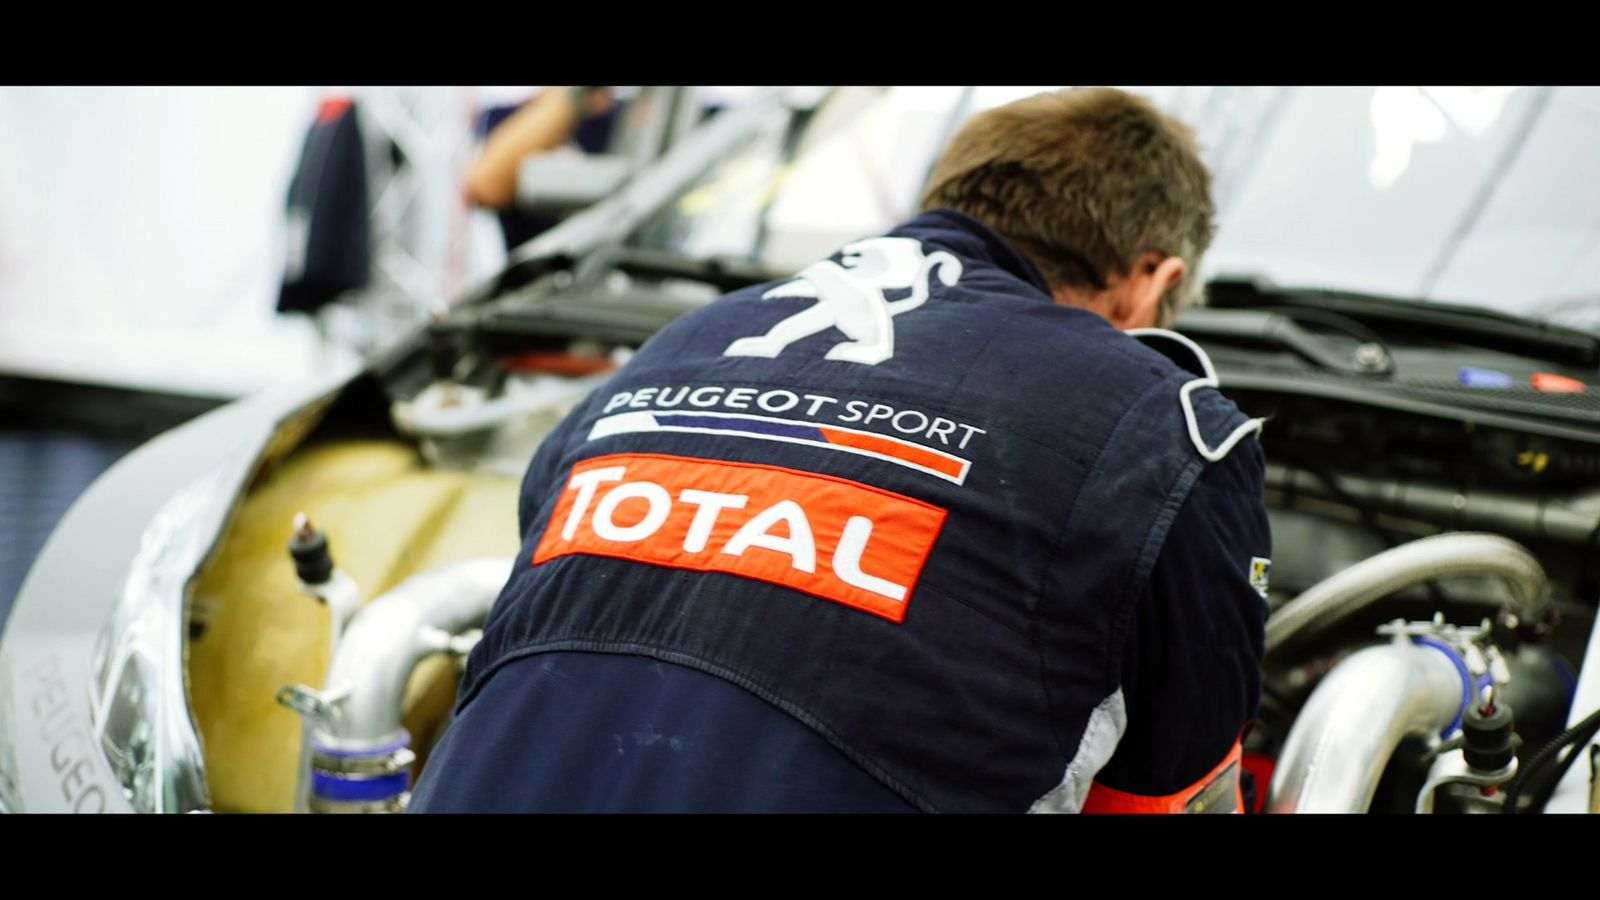 mechanic working on race car engine